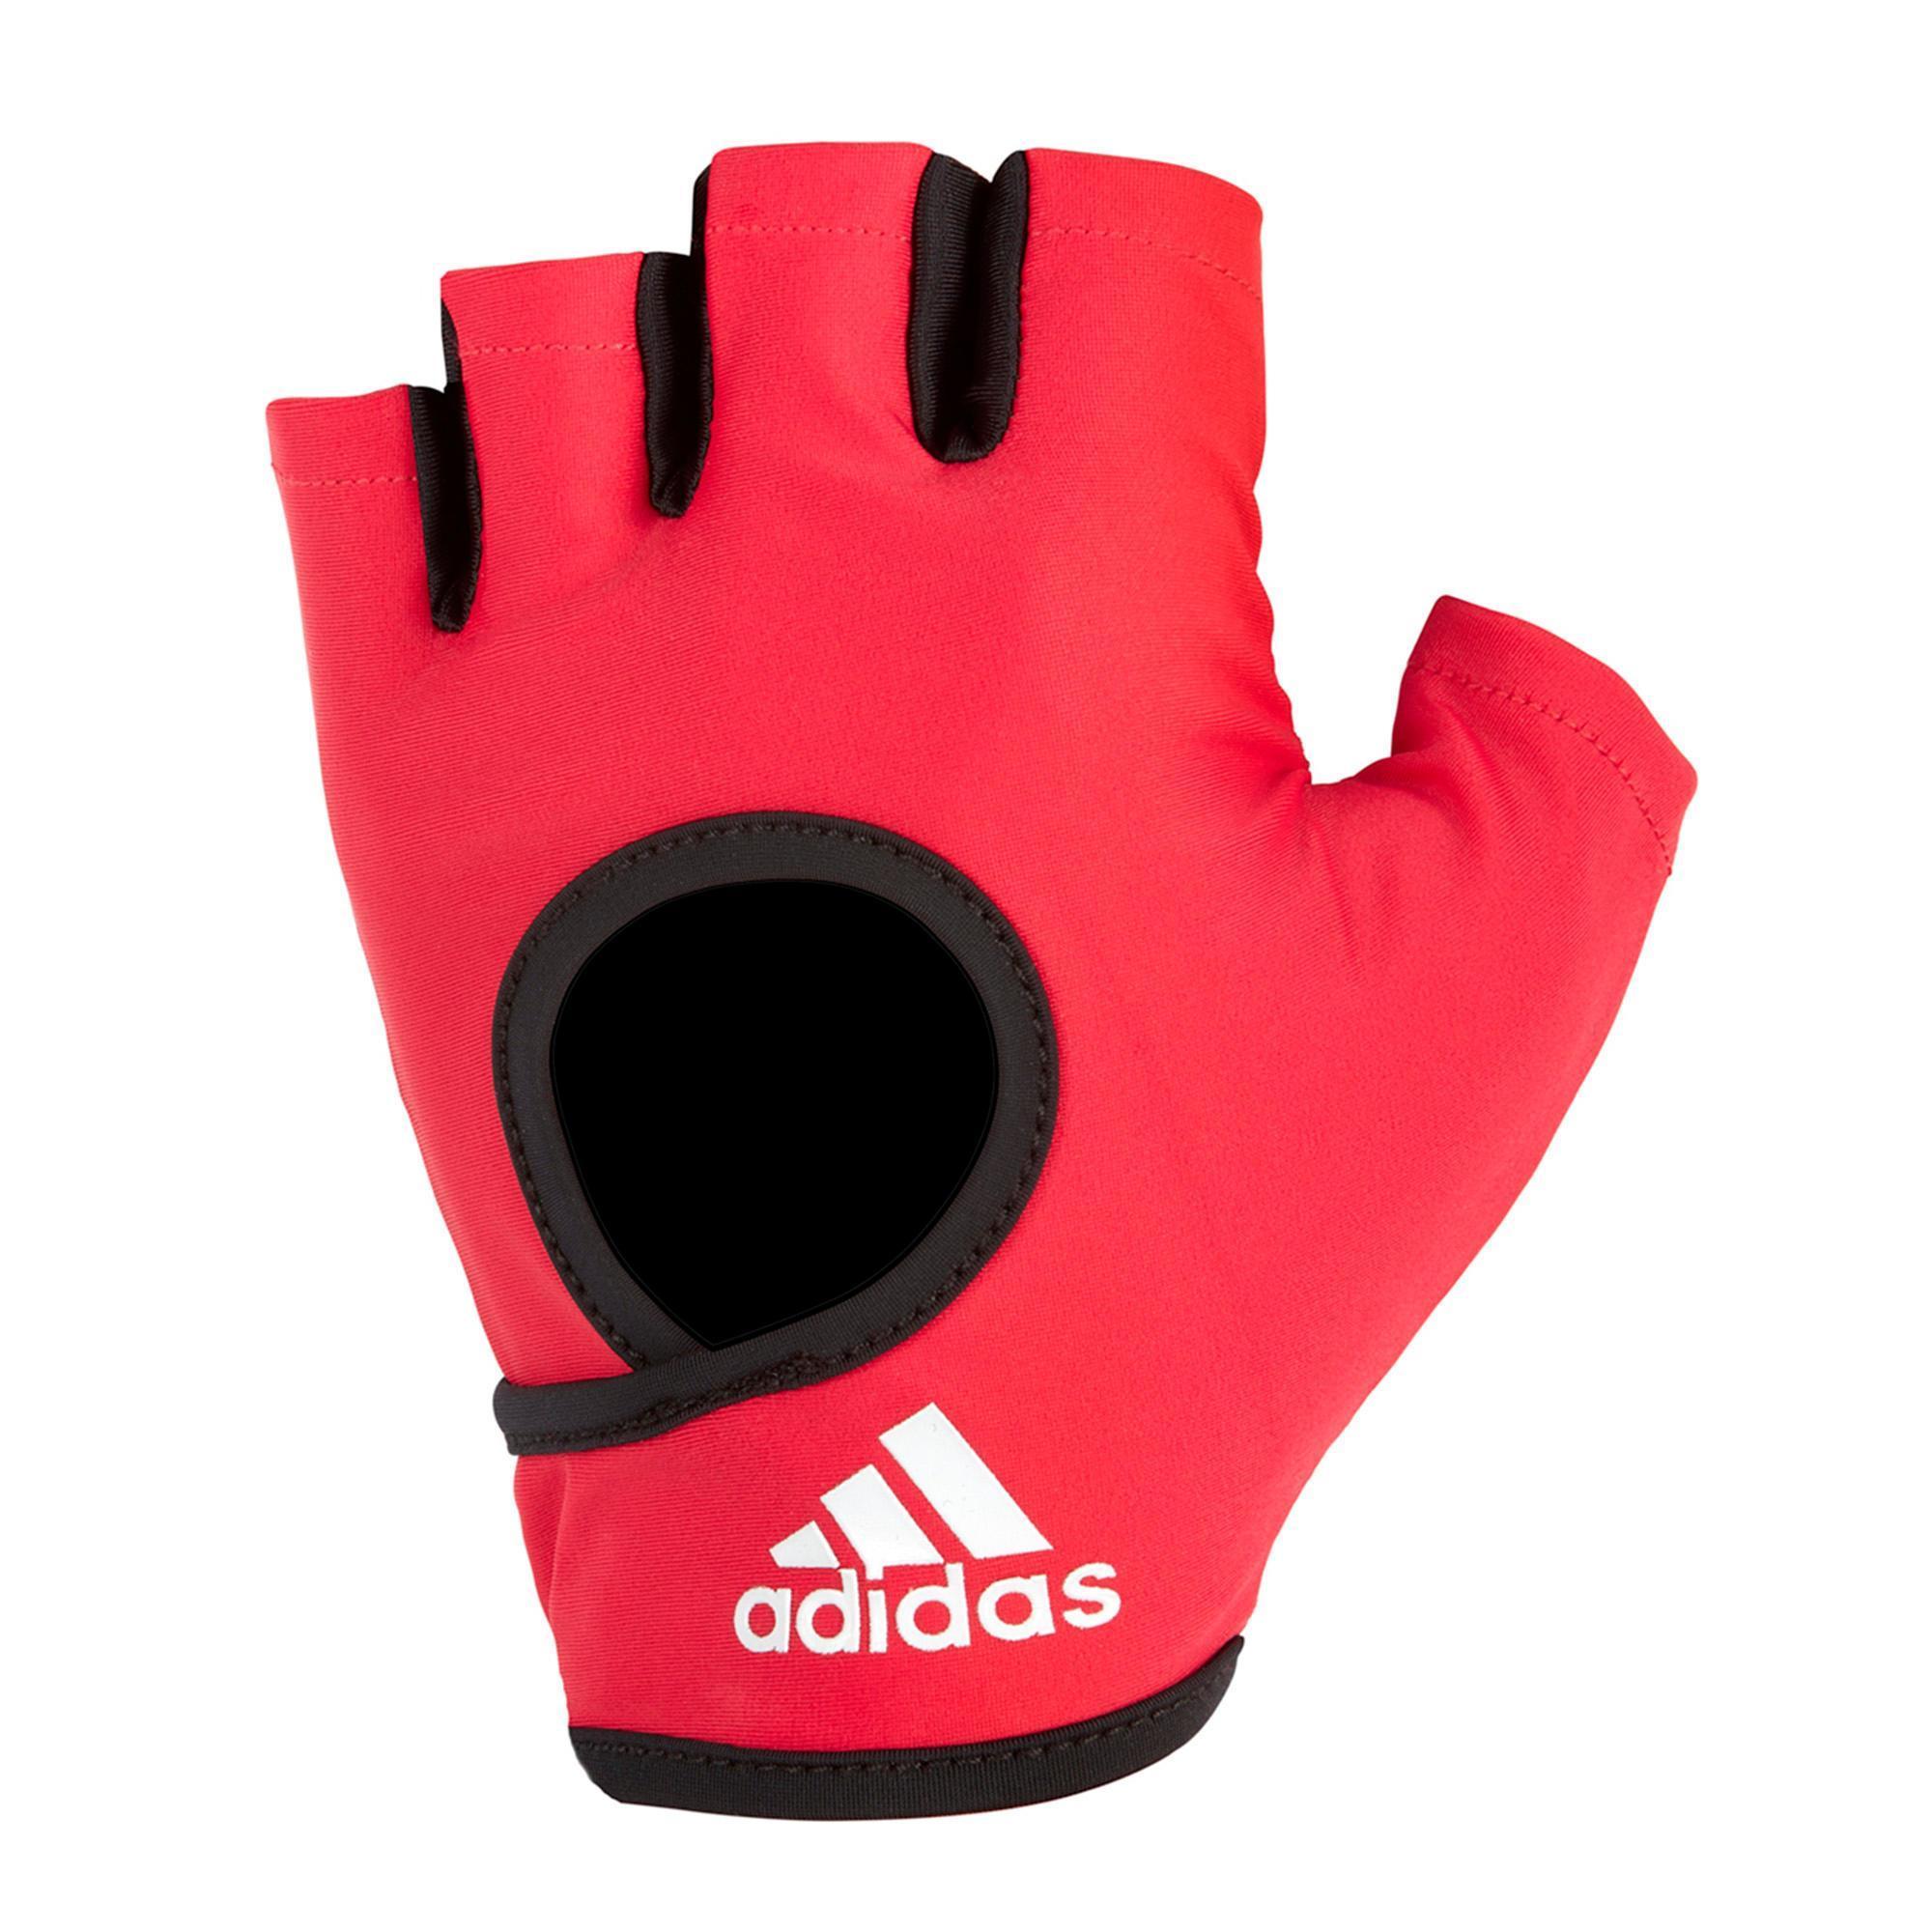 37b68d100d6 Fitness handschoenen adidas performance camo xl € 20.00 bij Blokker · Adidas  Traininghandschoenen Climalite